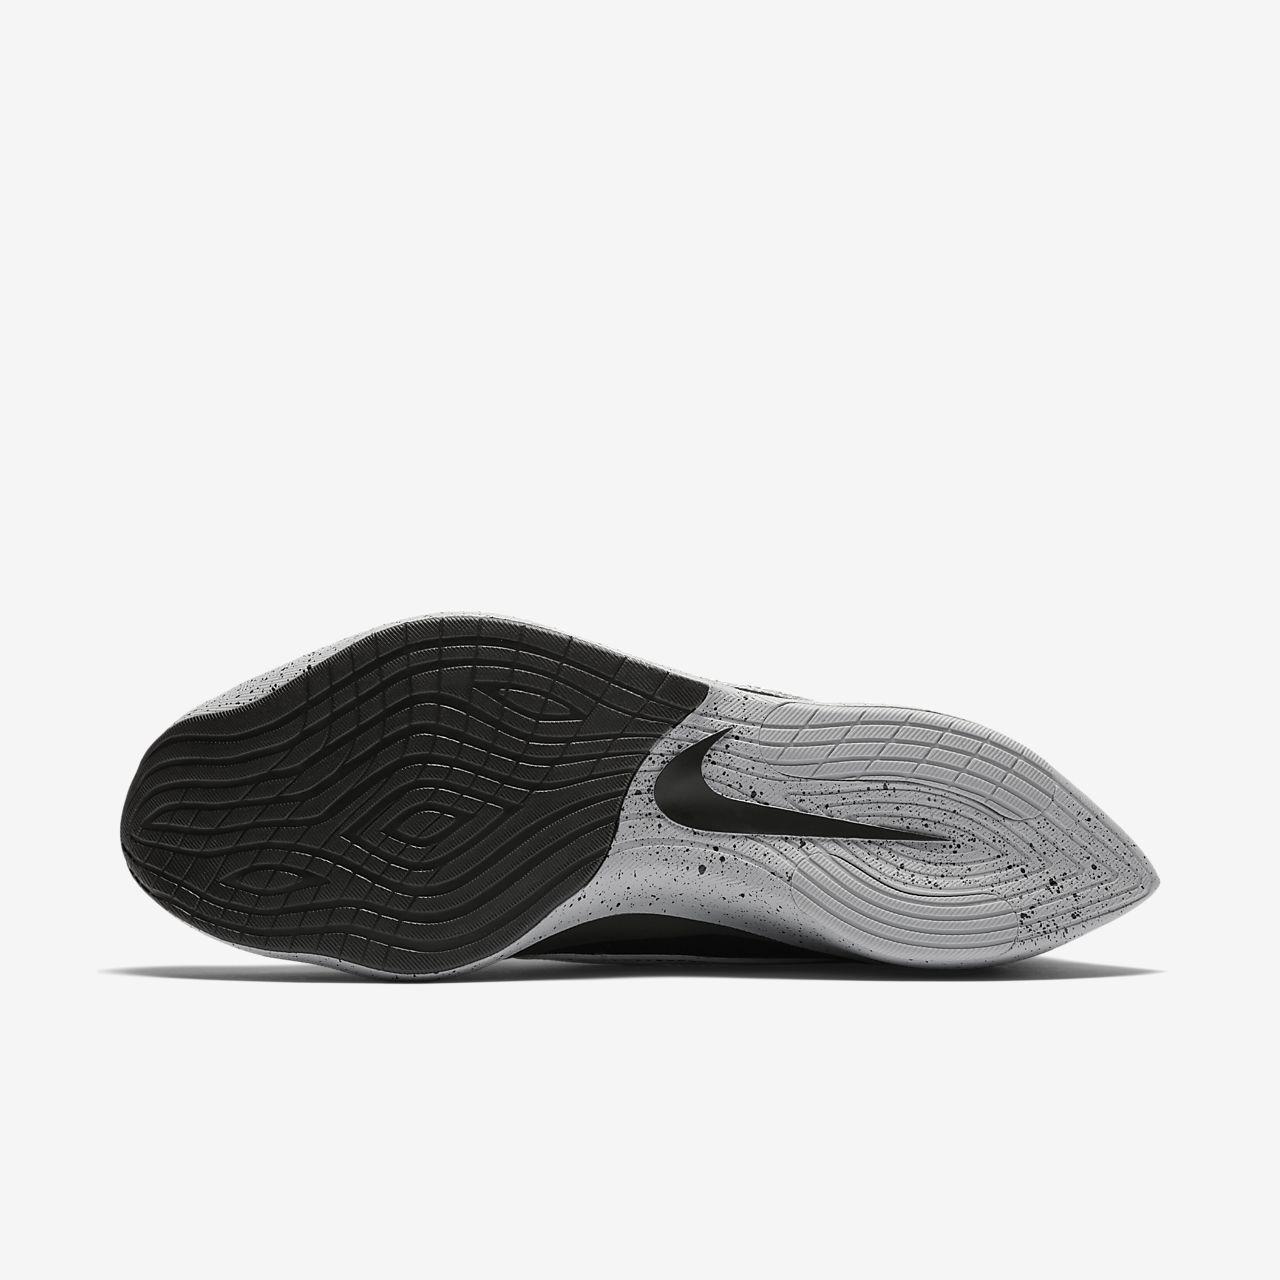 new concept 8edf5 aa906 ... Nike Moon Racer Men s Shoe